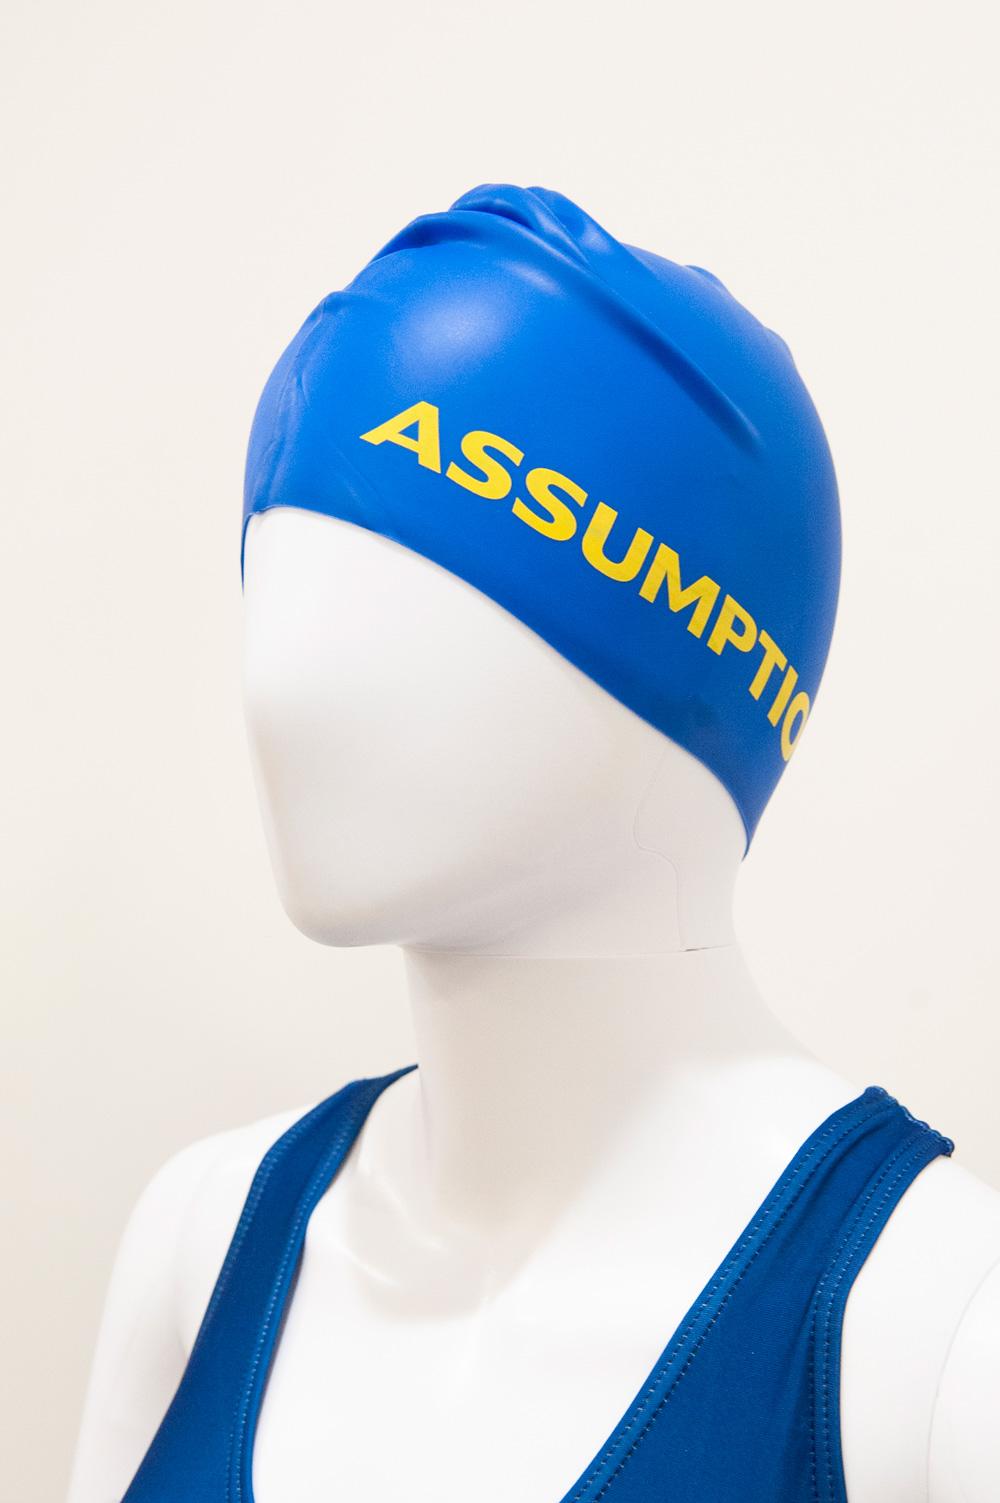 Assumption Sports Uniforms